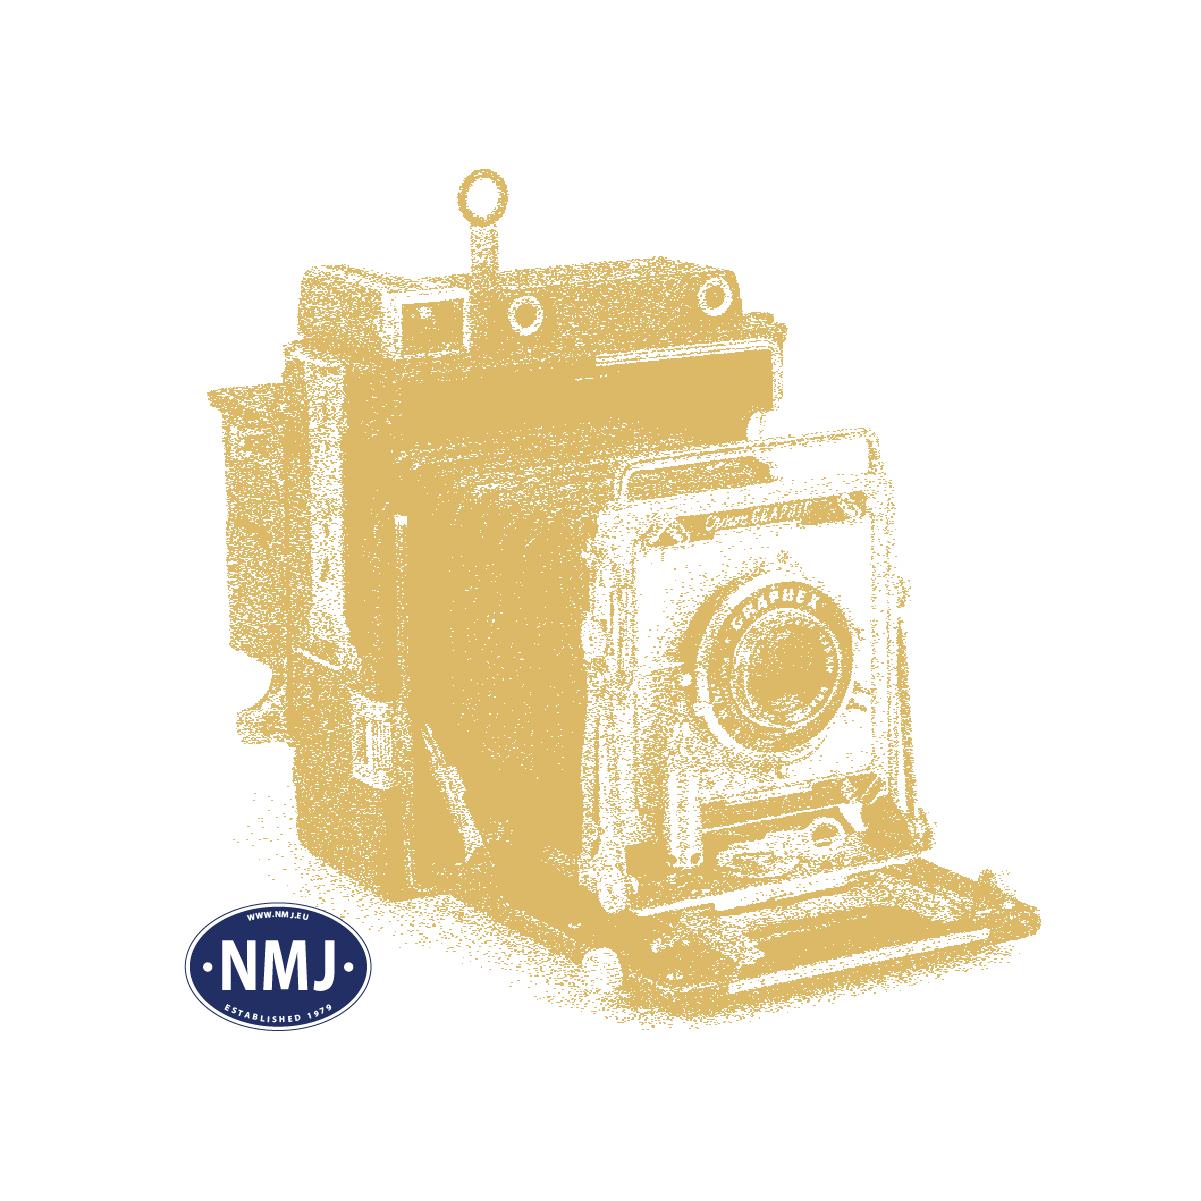 TAM82135 - LP-35 Insignia White, Lacquer Paint, 10ml